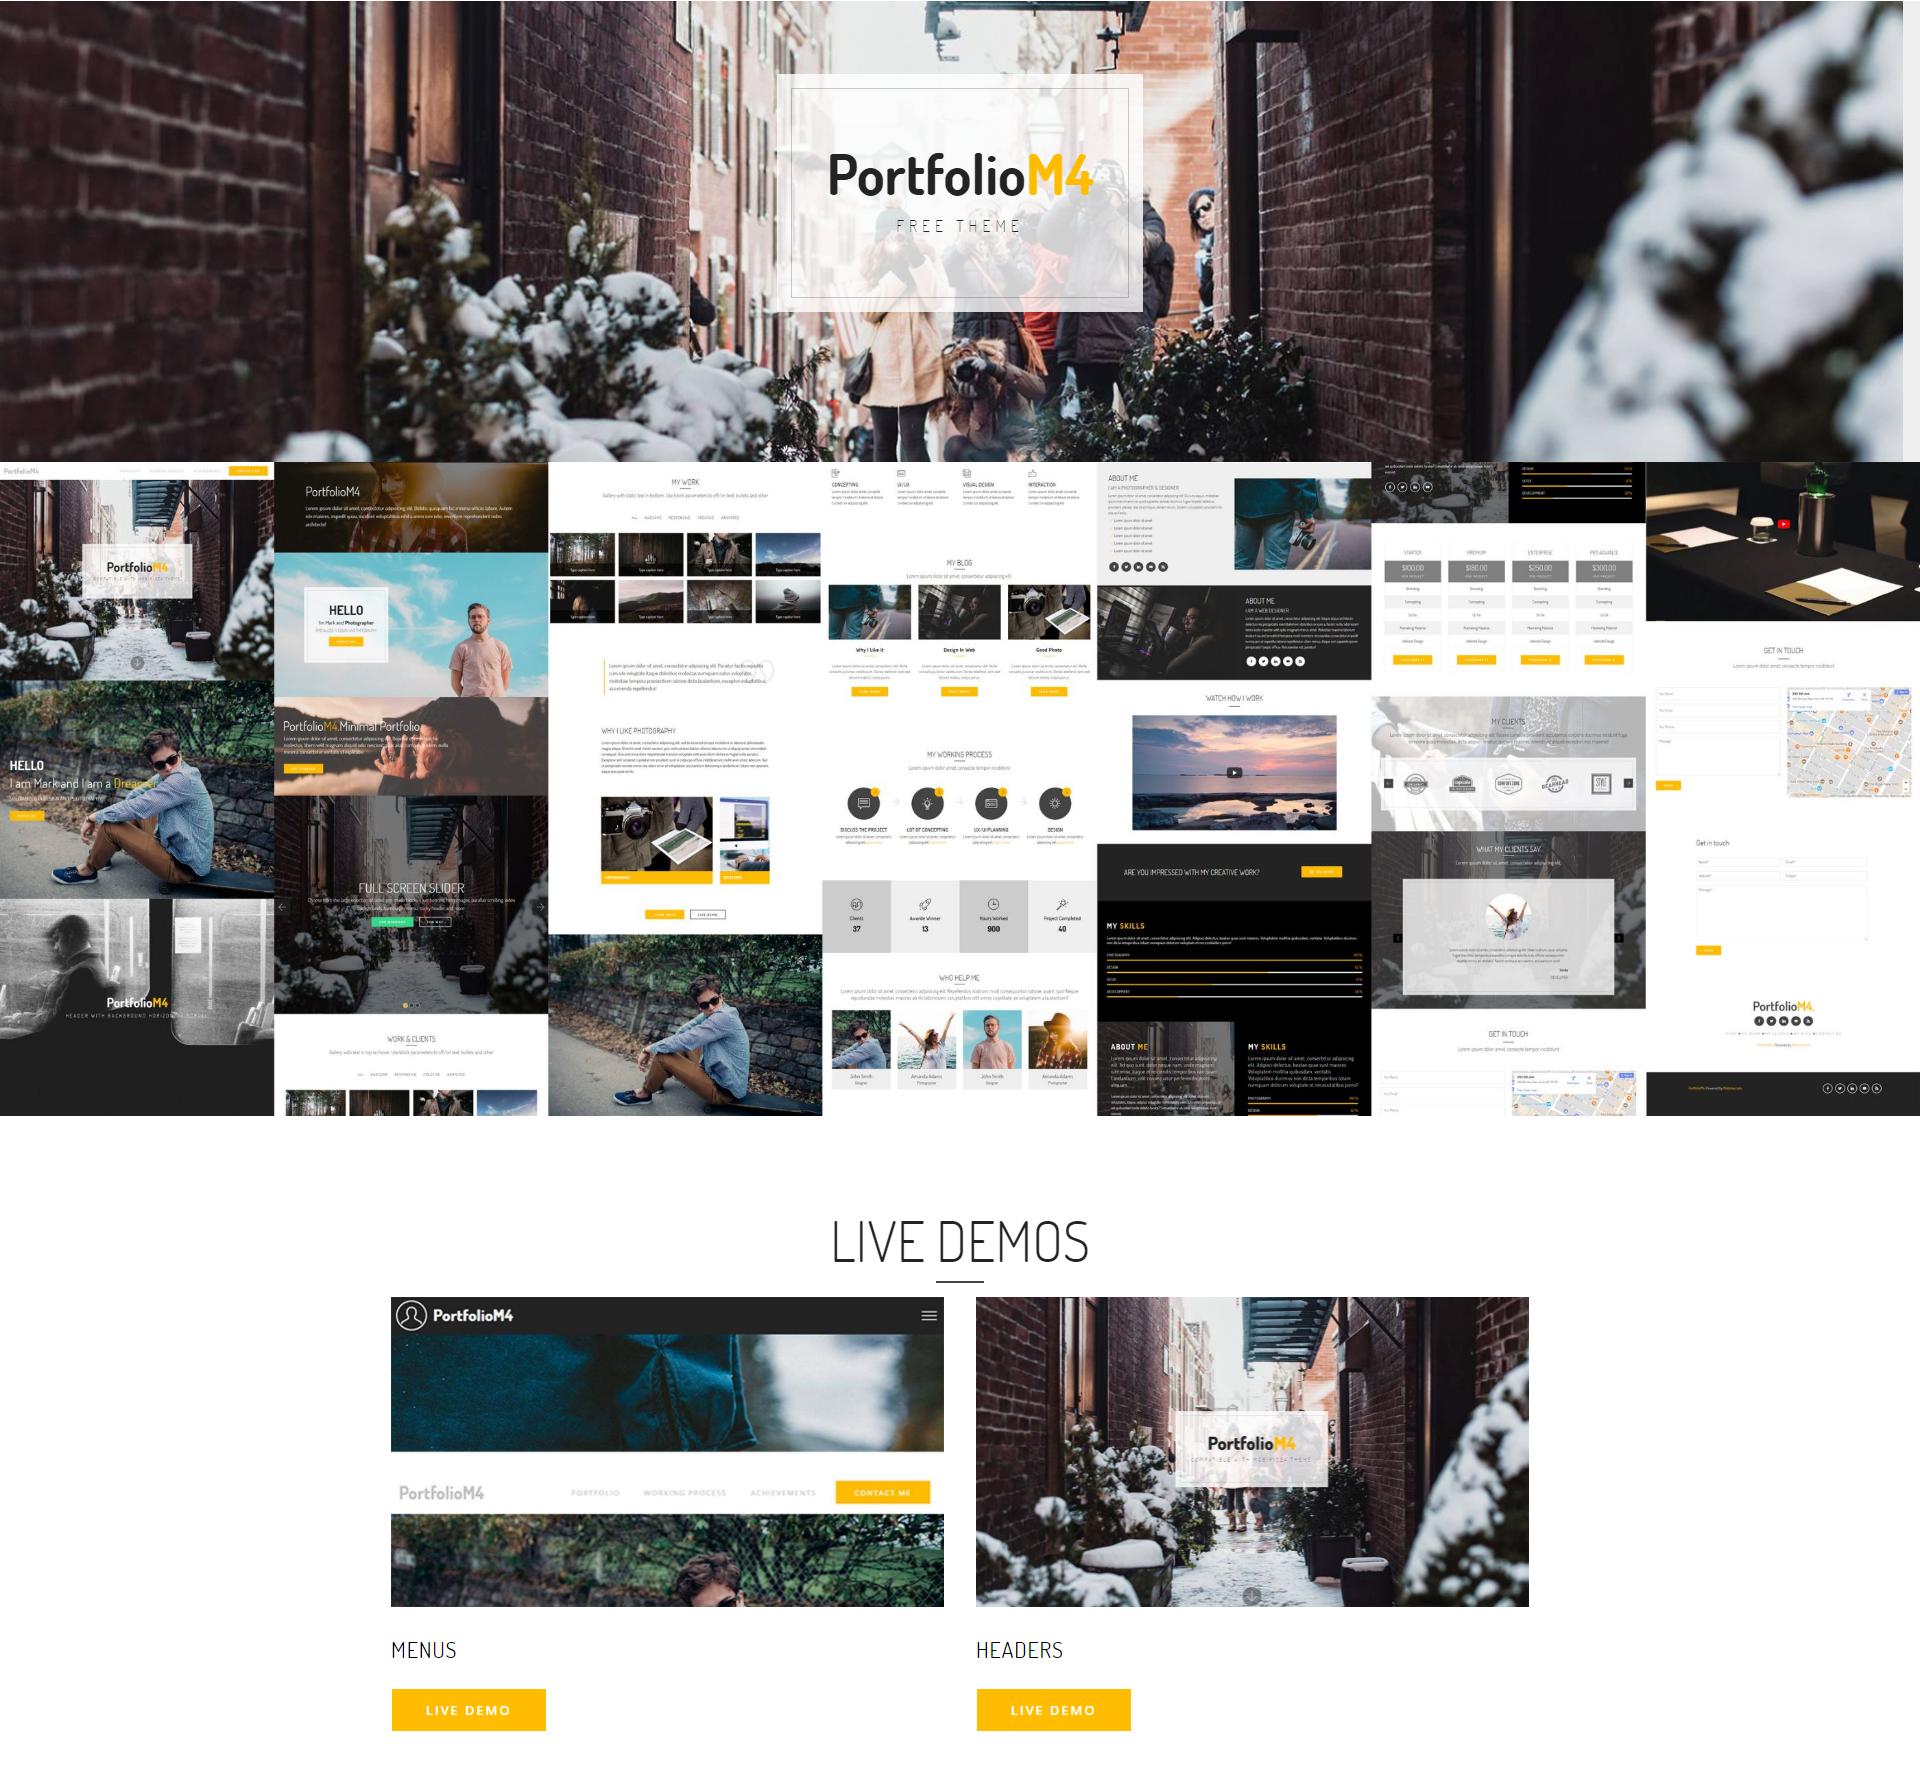 CSS3 Bootstrap PortfolioM4 Themes